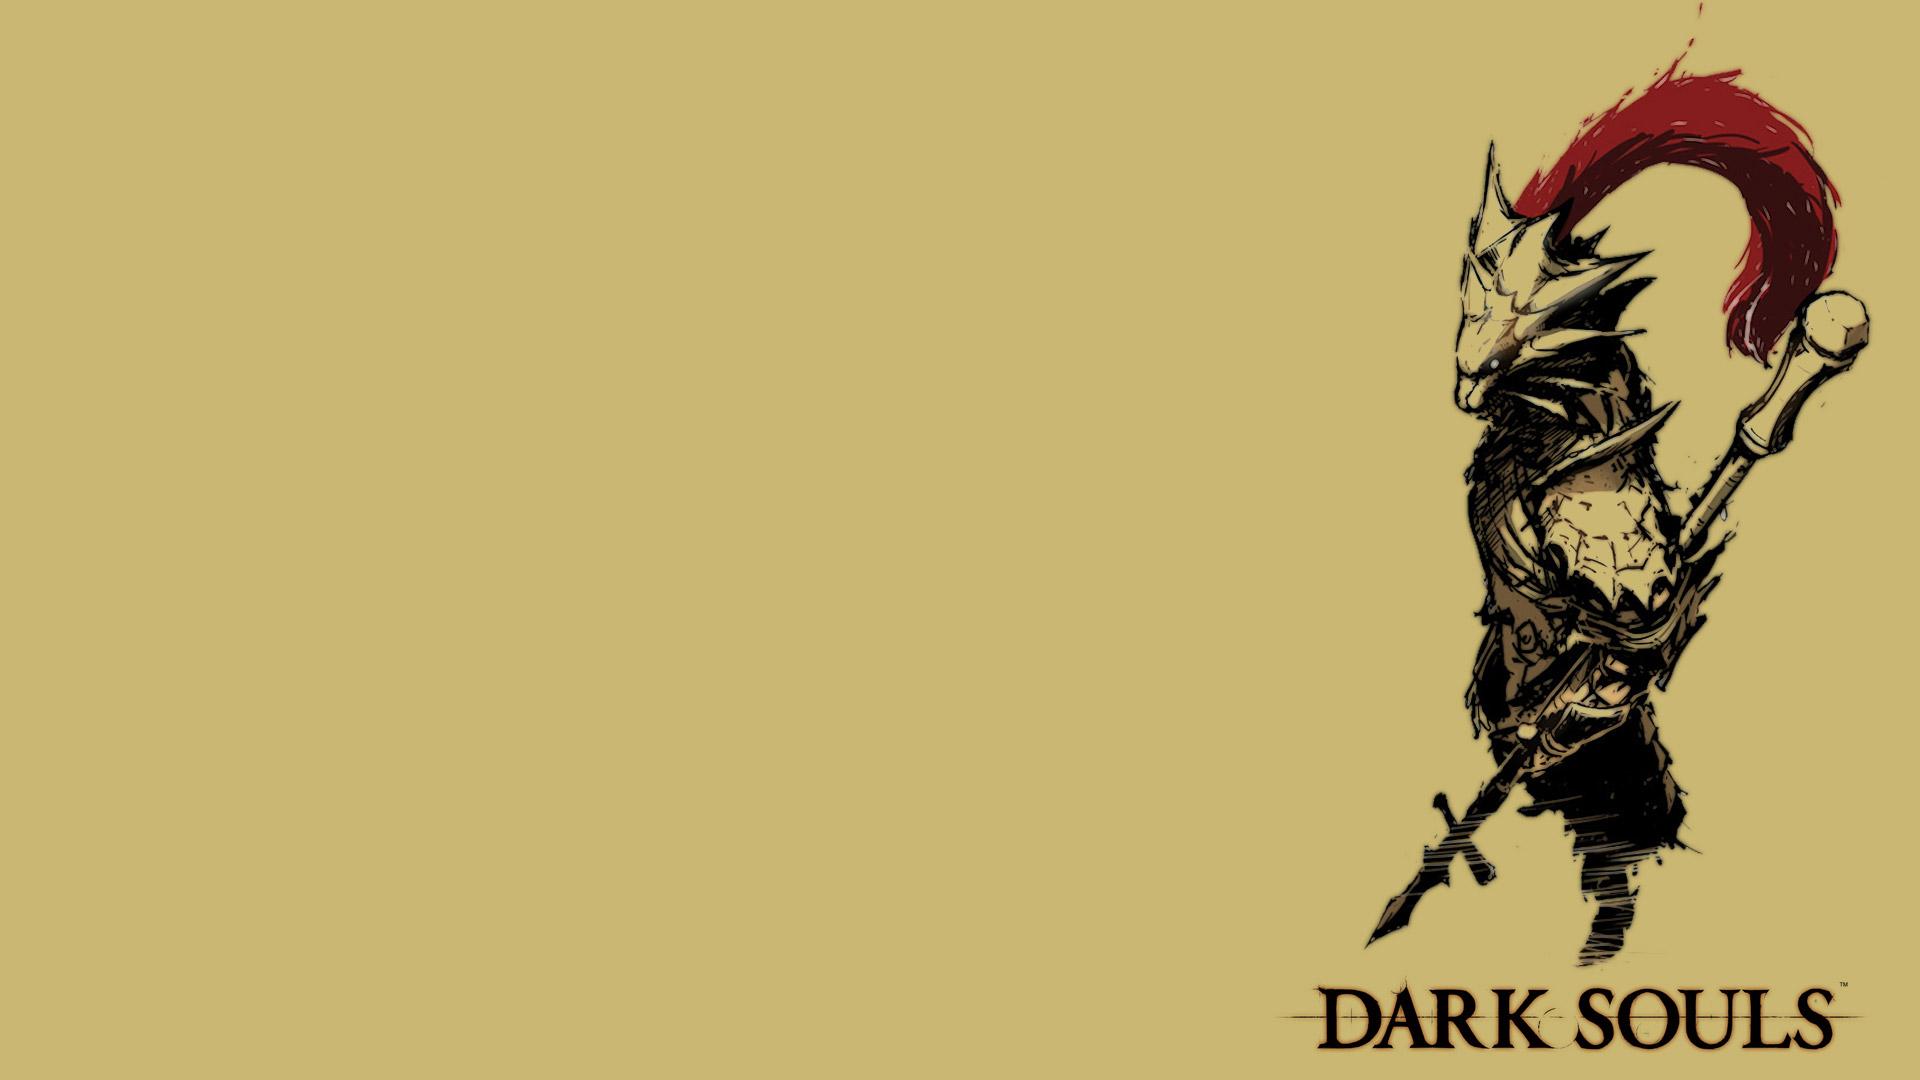 Free Dark Souls Wallpaper in 1920x1080